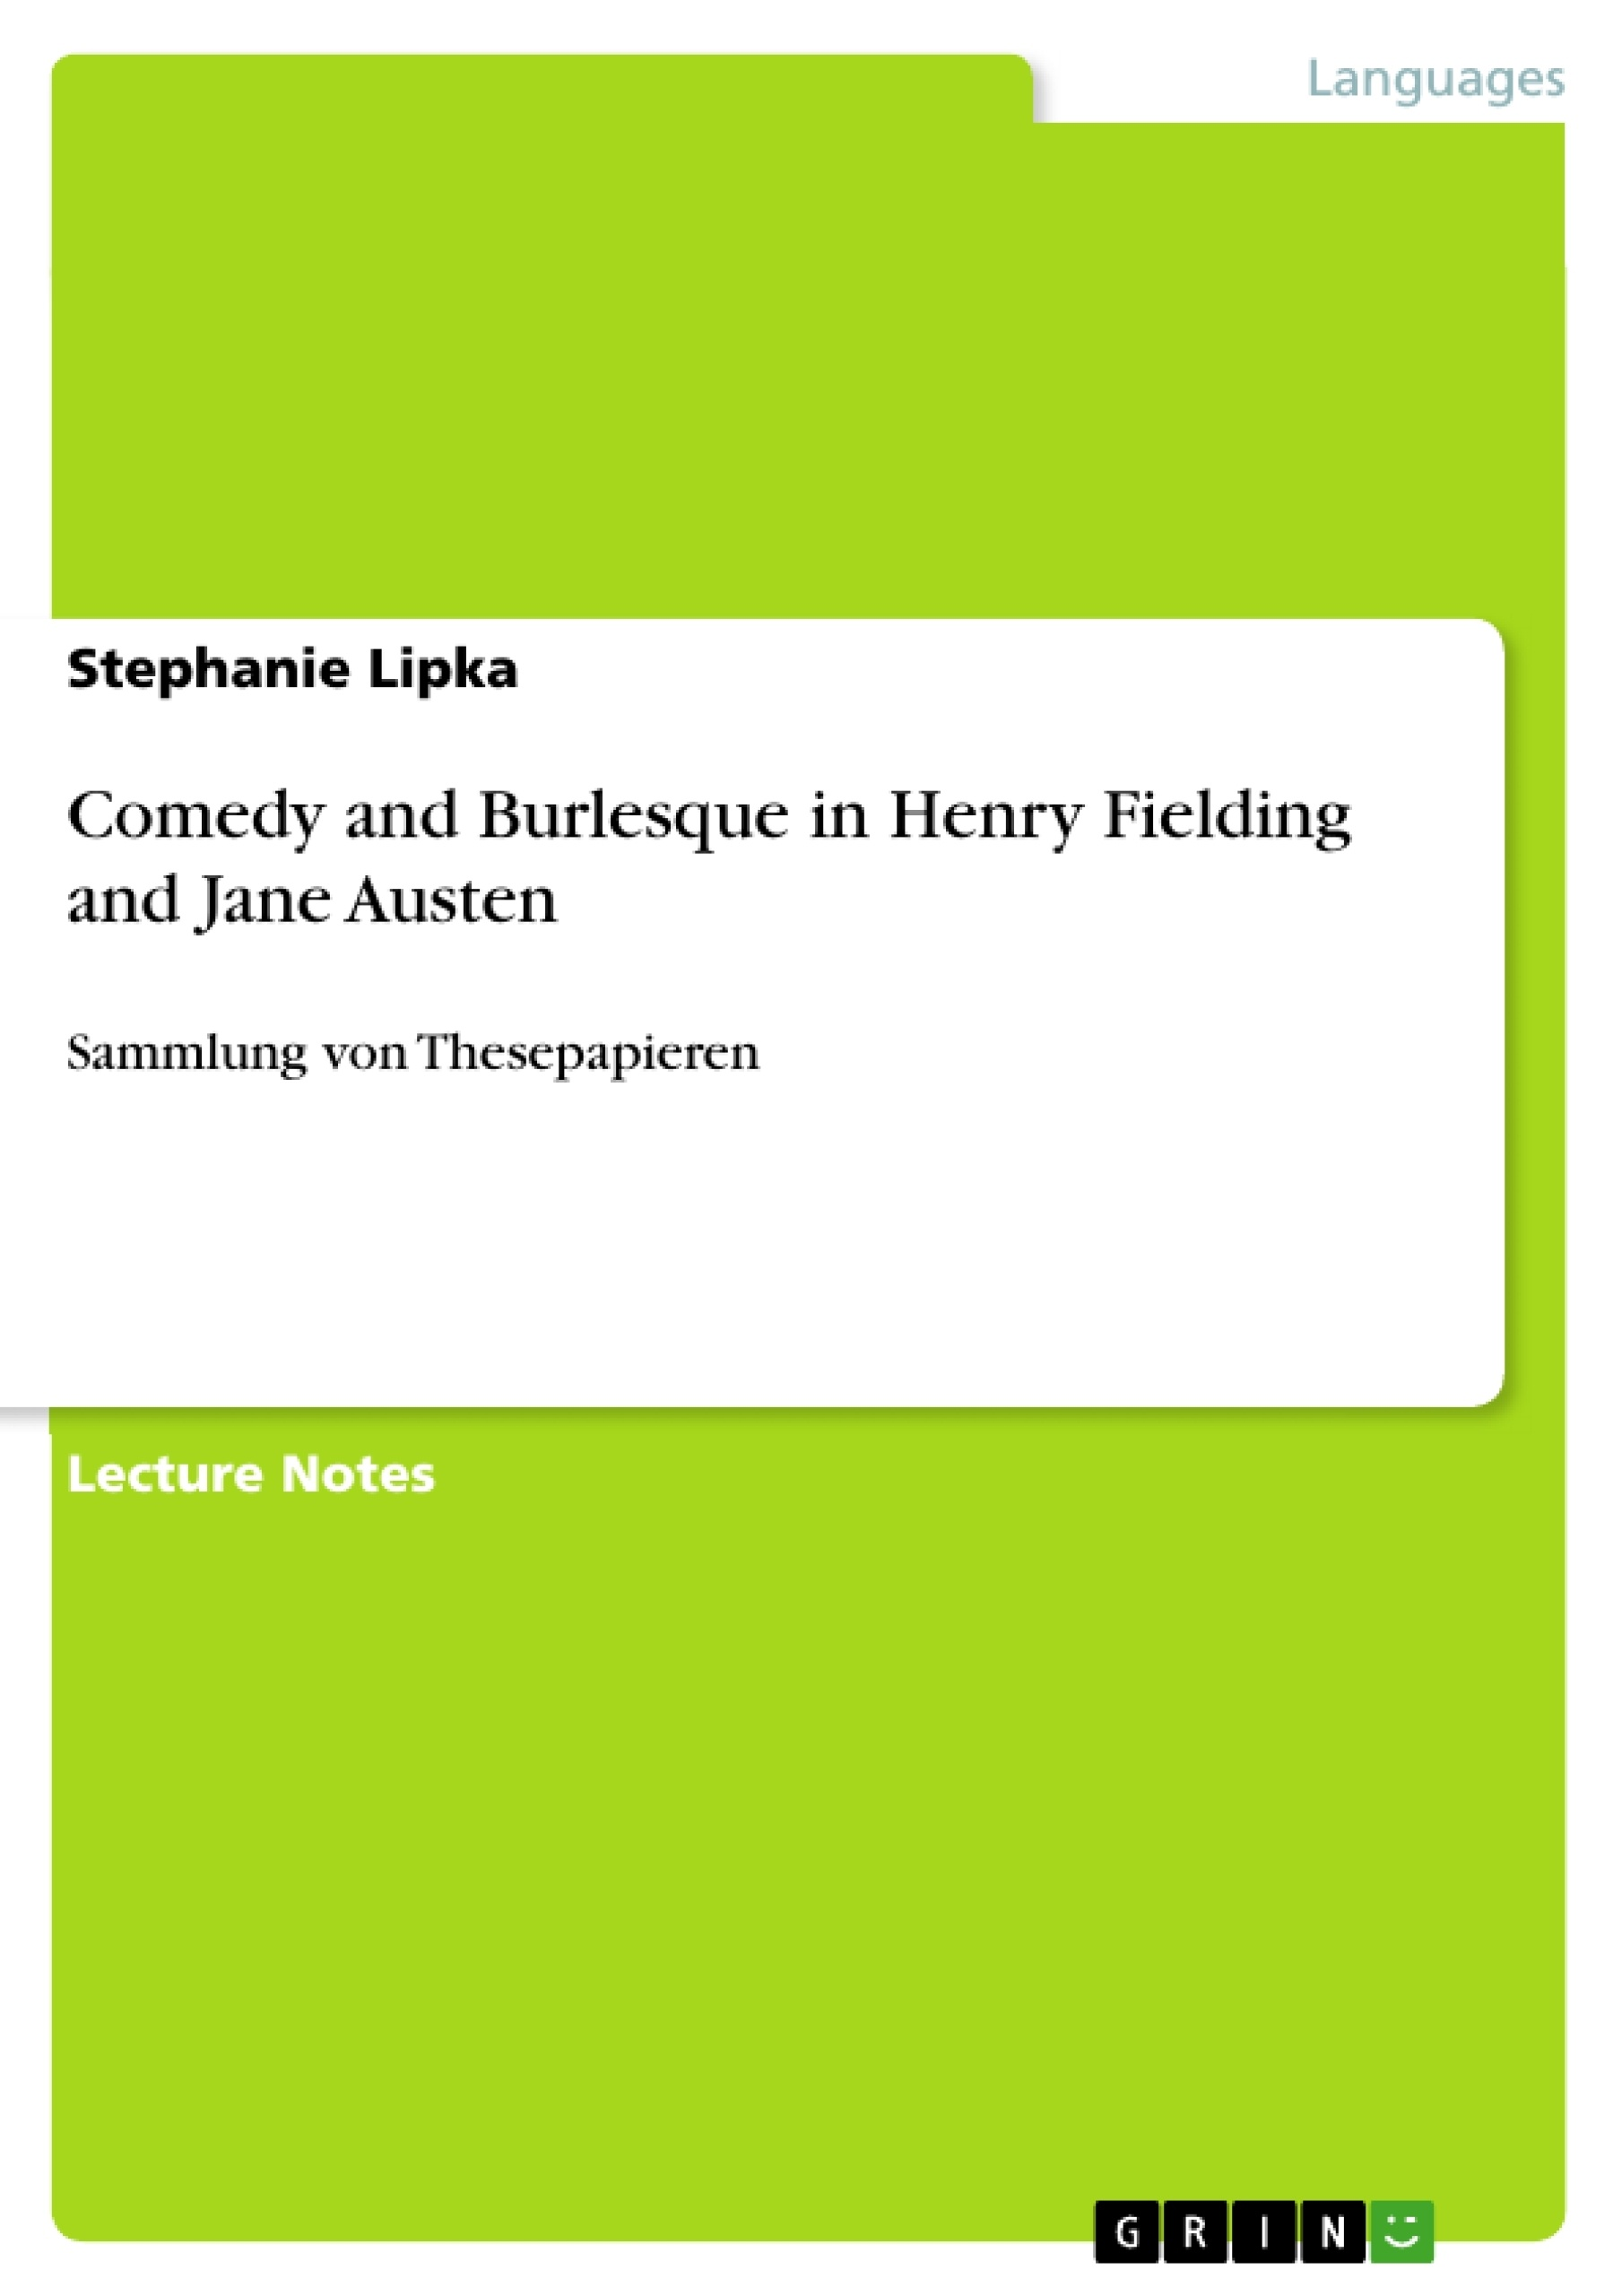 essay on jane austen's life